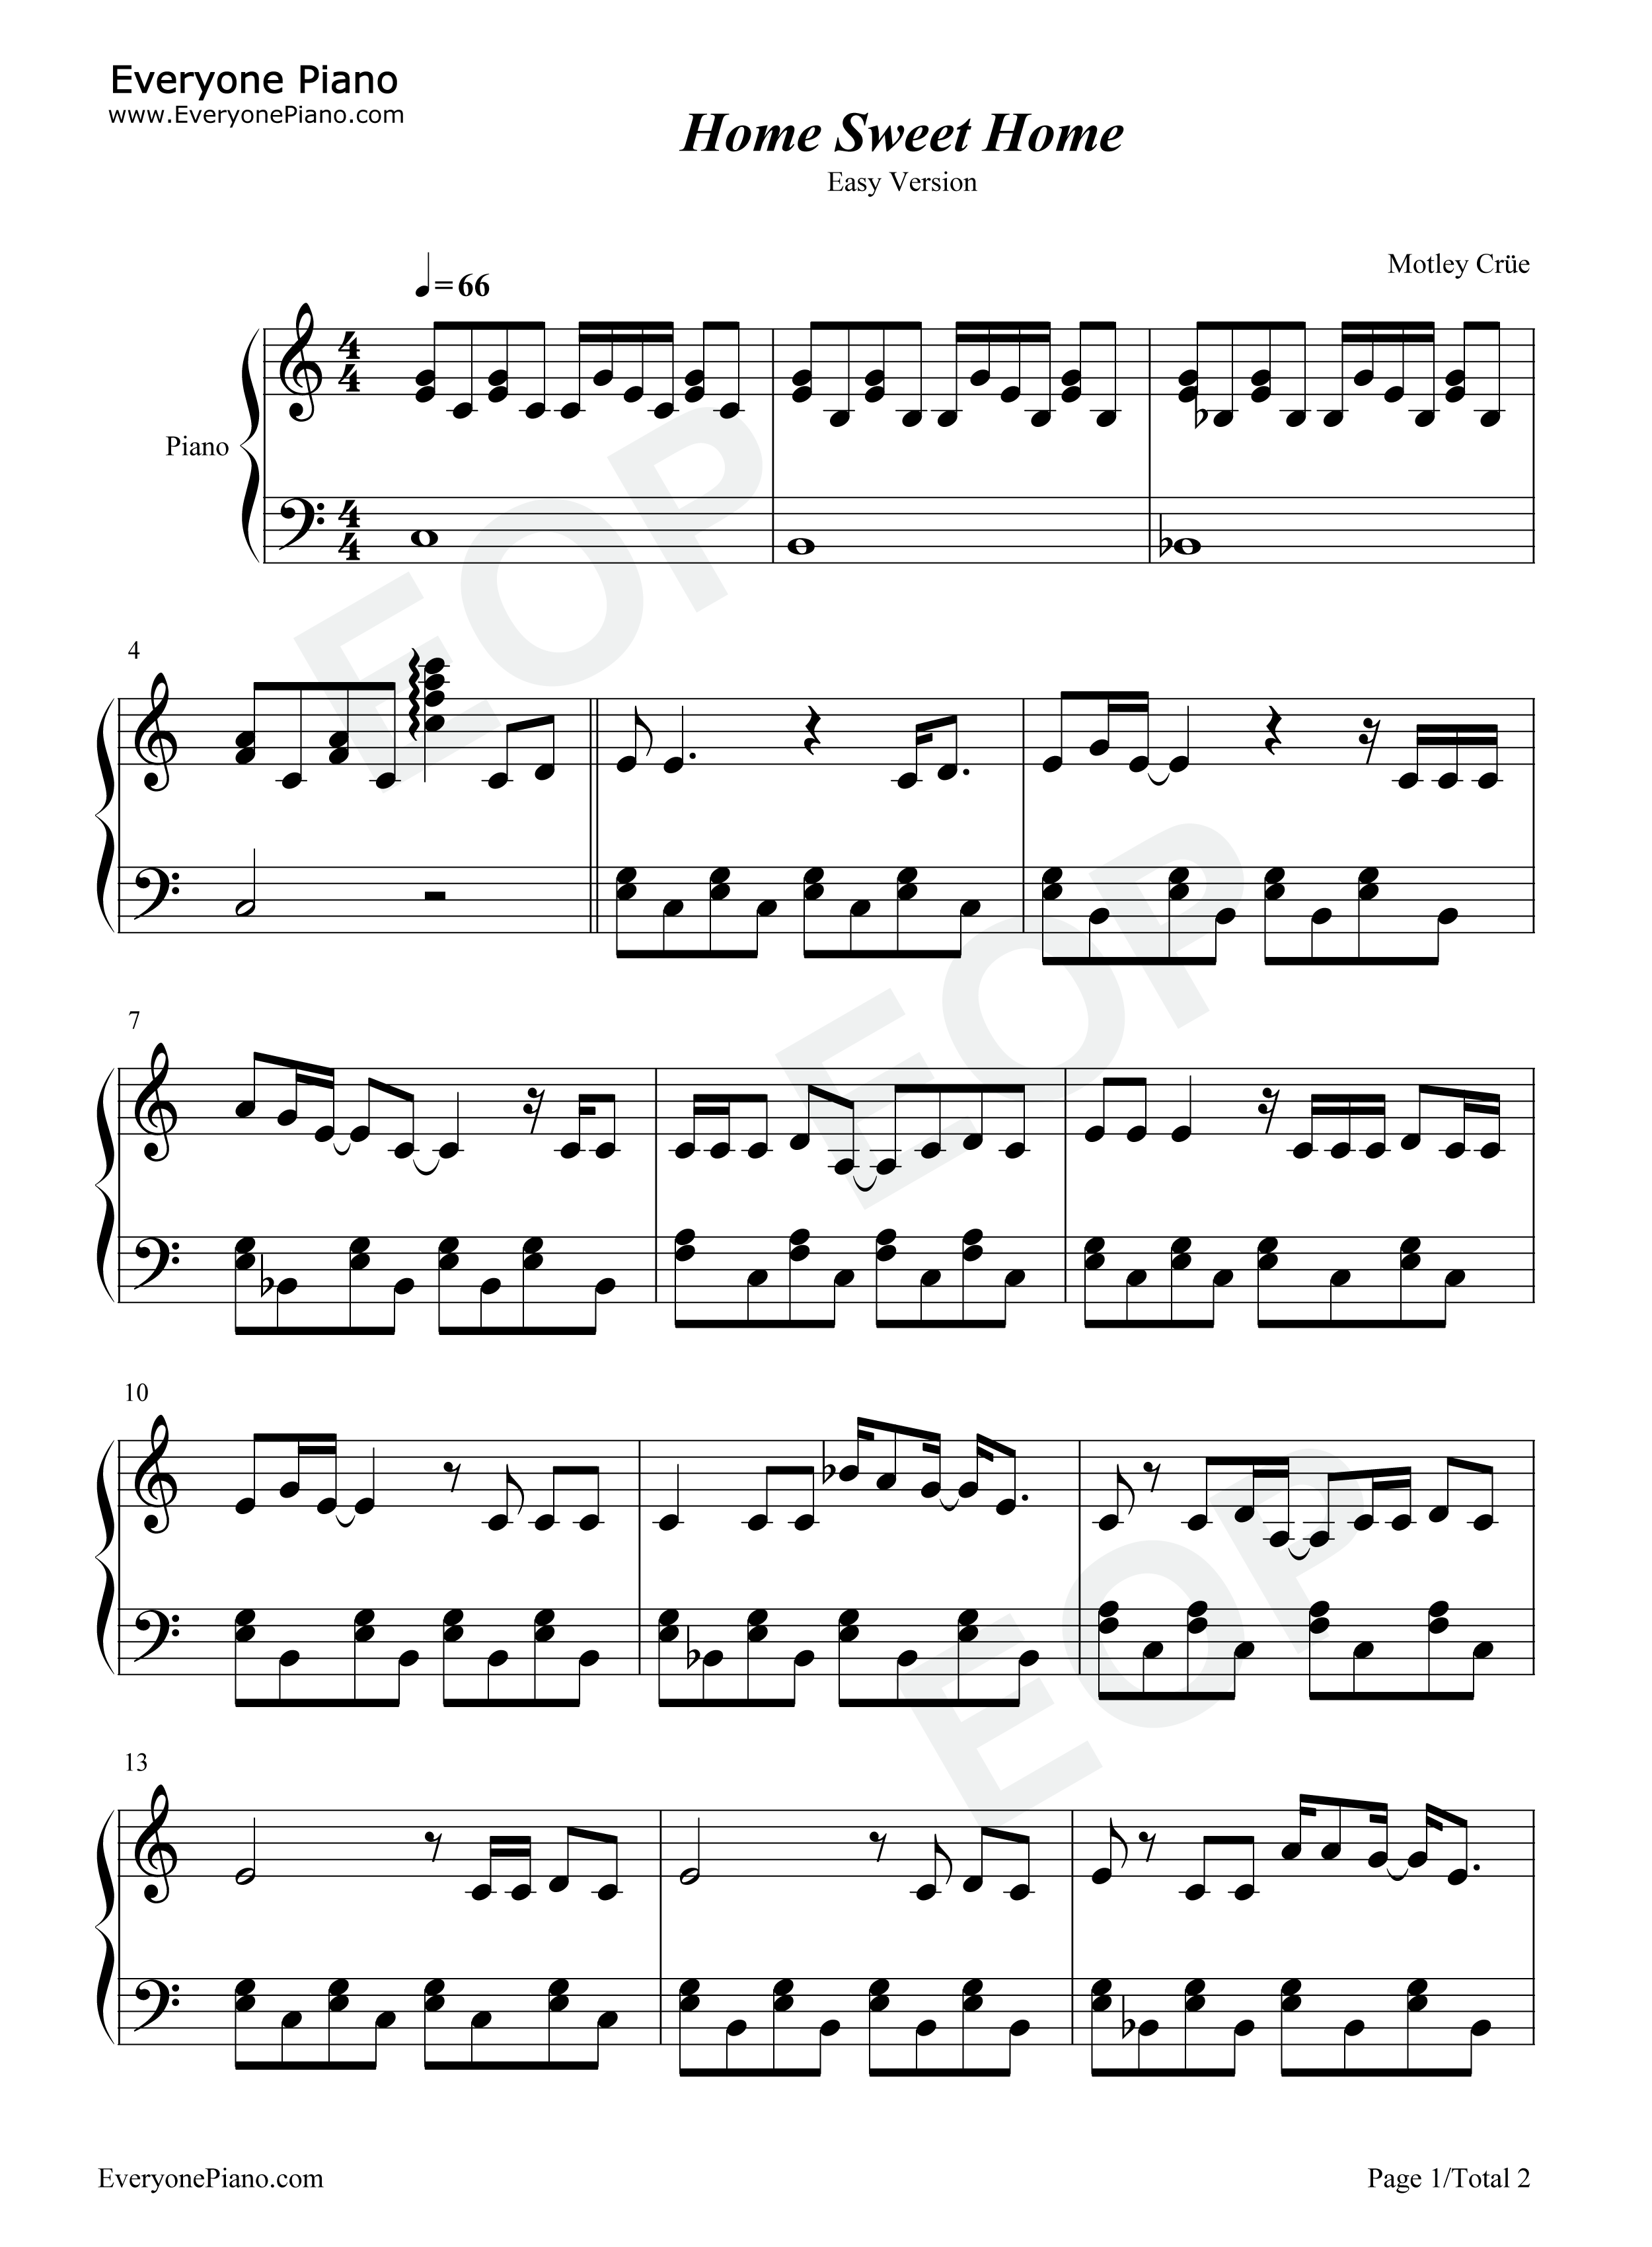 Home Sweet Home Sheet Music Piano Carnavalsmusic